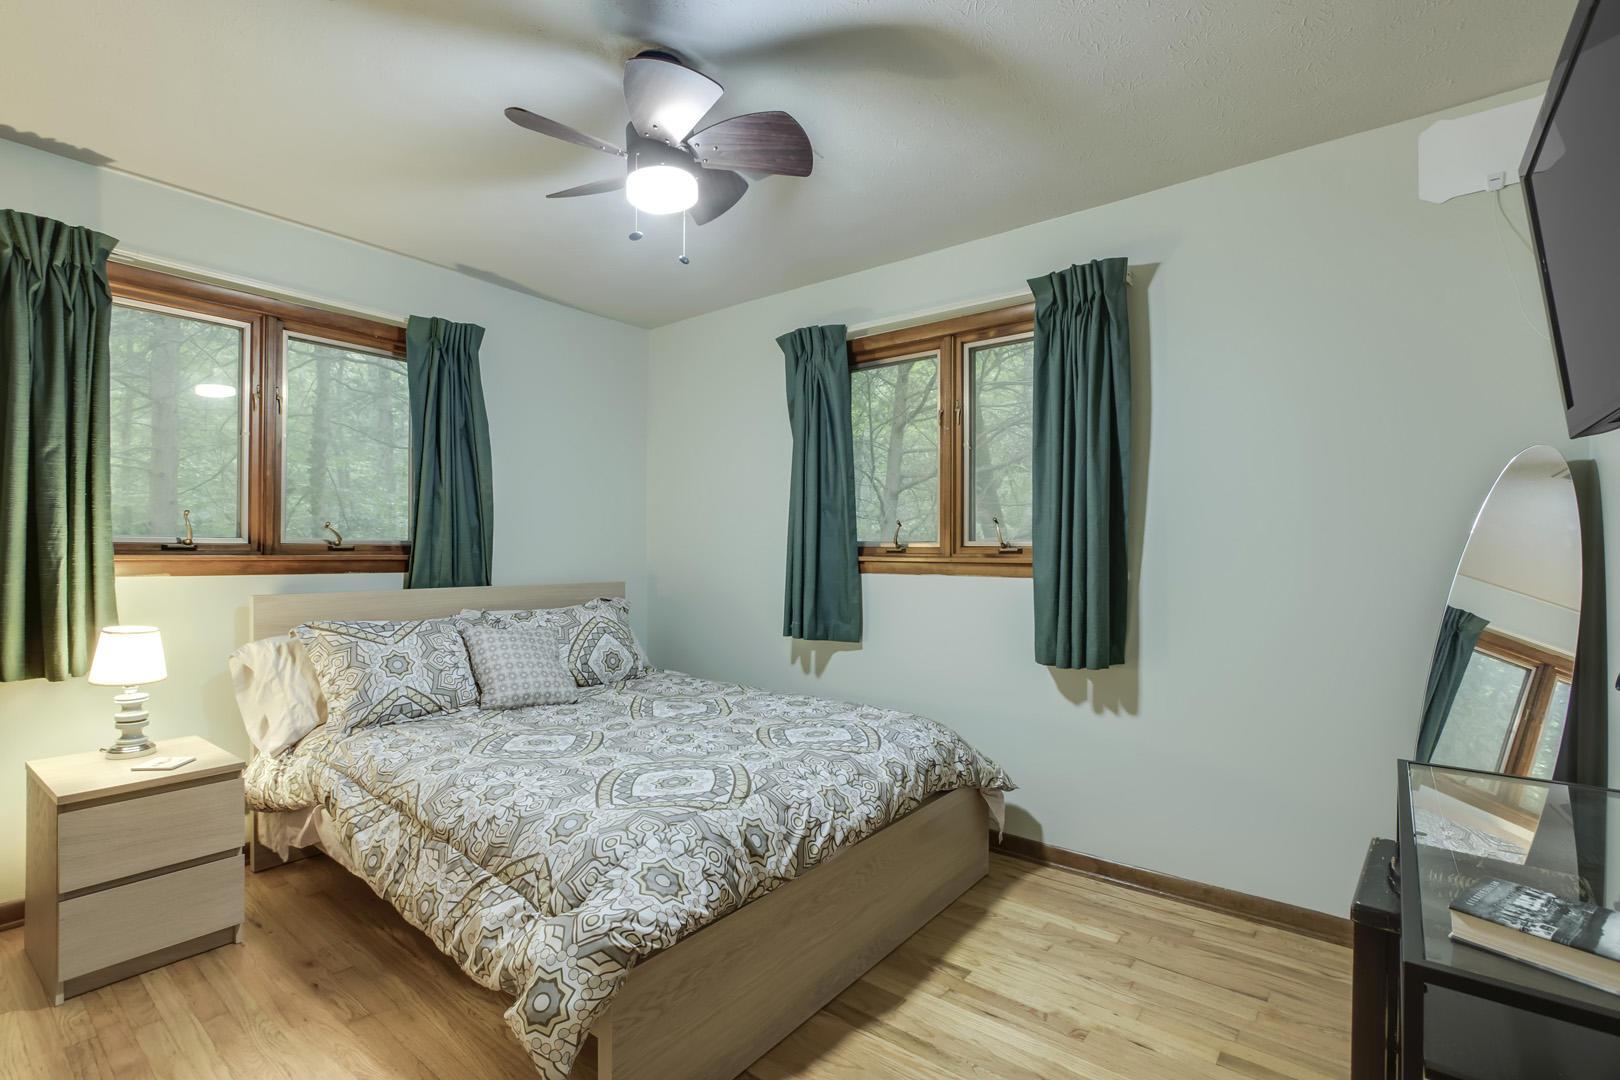 148 Nebraska Ave, Oak Ridge, Tennessee 37830, 3 Bedrooms Bedrooms, ,2 BathroomsBathrooms,Single Family,For Sale,Nebraska,1088944